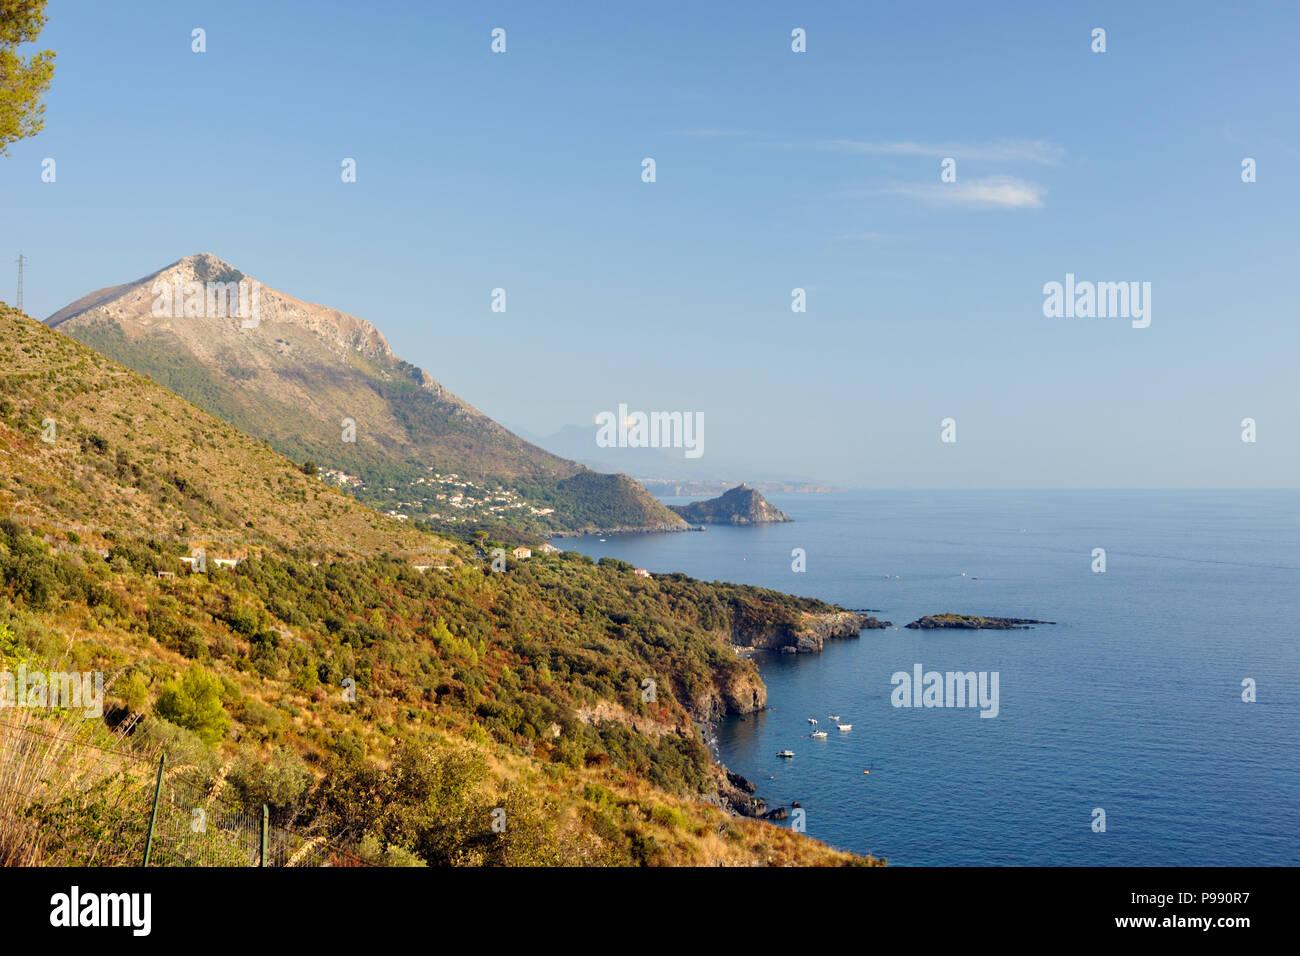 italy, basilicata, maratea, coast Stock Photo